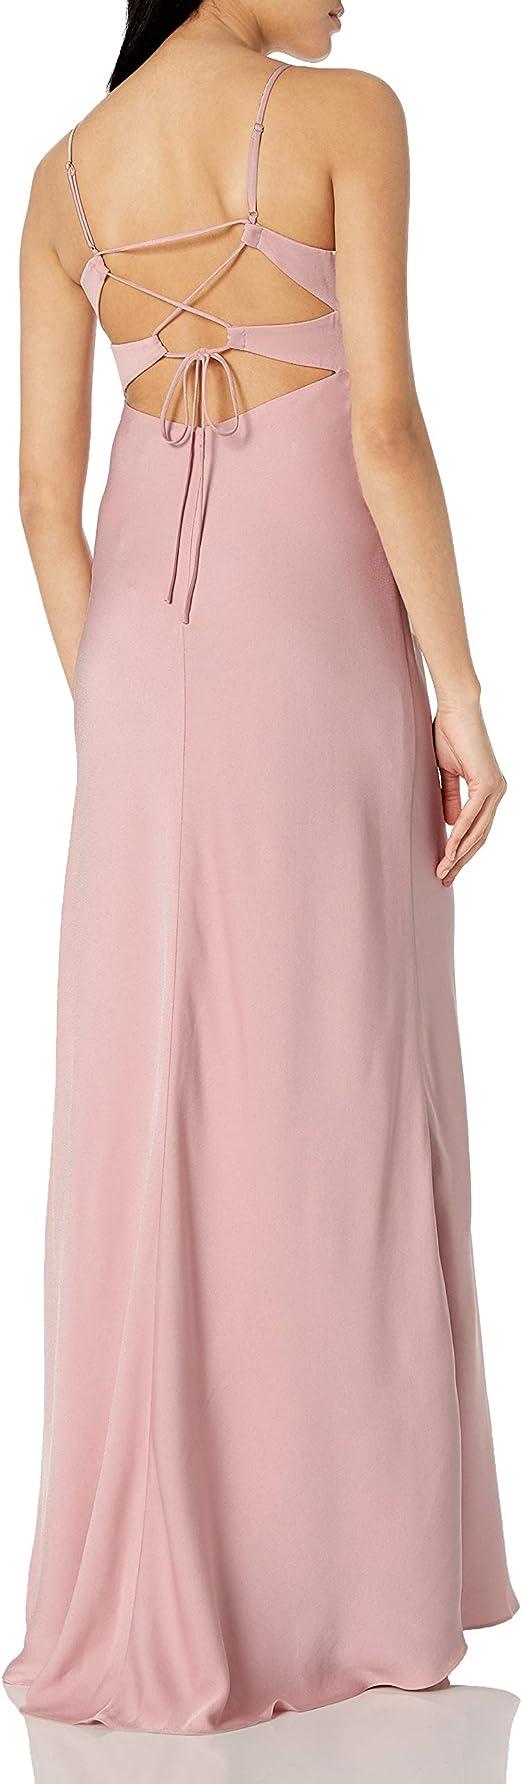 BCBGMAXAZRIA Womens FAE Sleeveless Lace-up Gown Dress